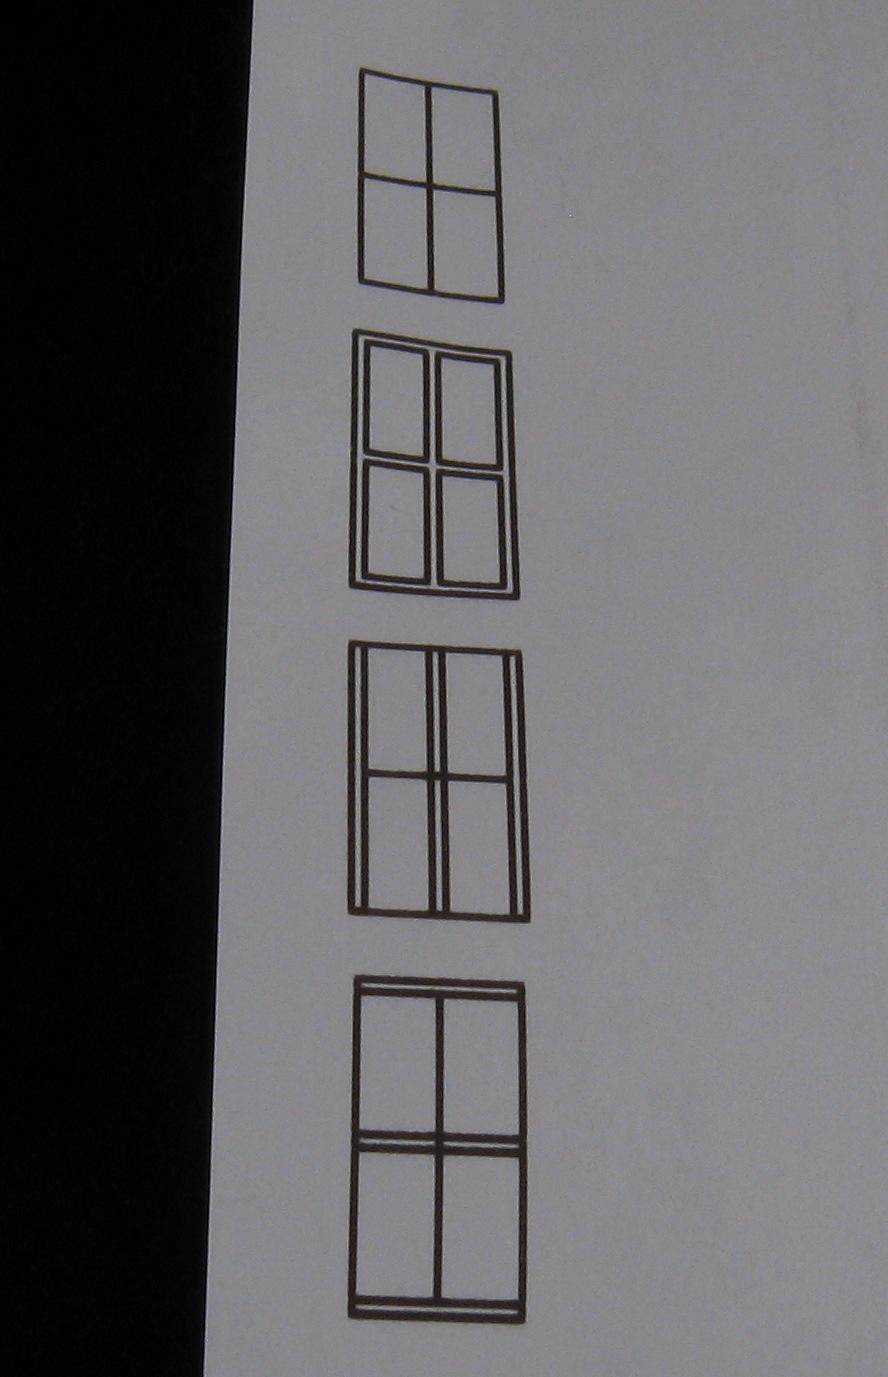 Line Drawing Unicode : Dan malec s adafruit iot printer box drawing cheatsheet